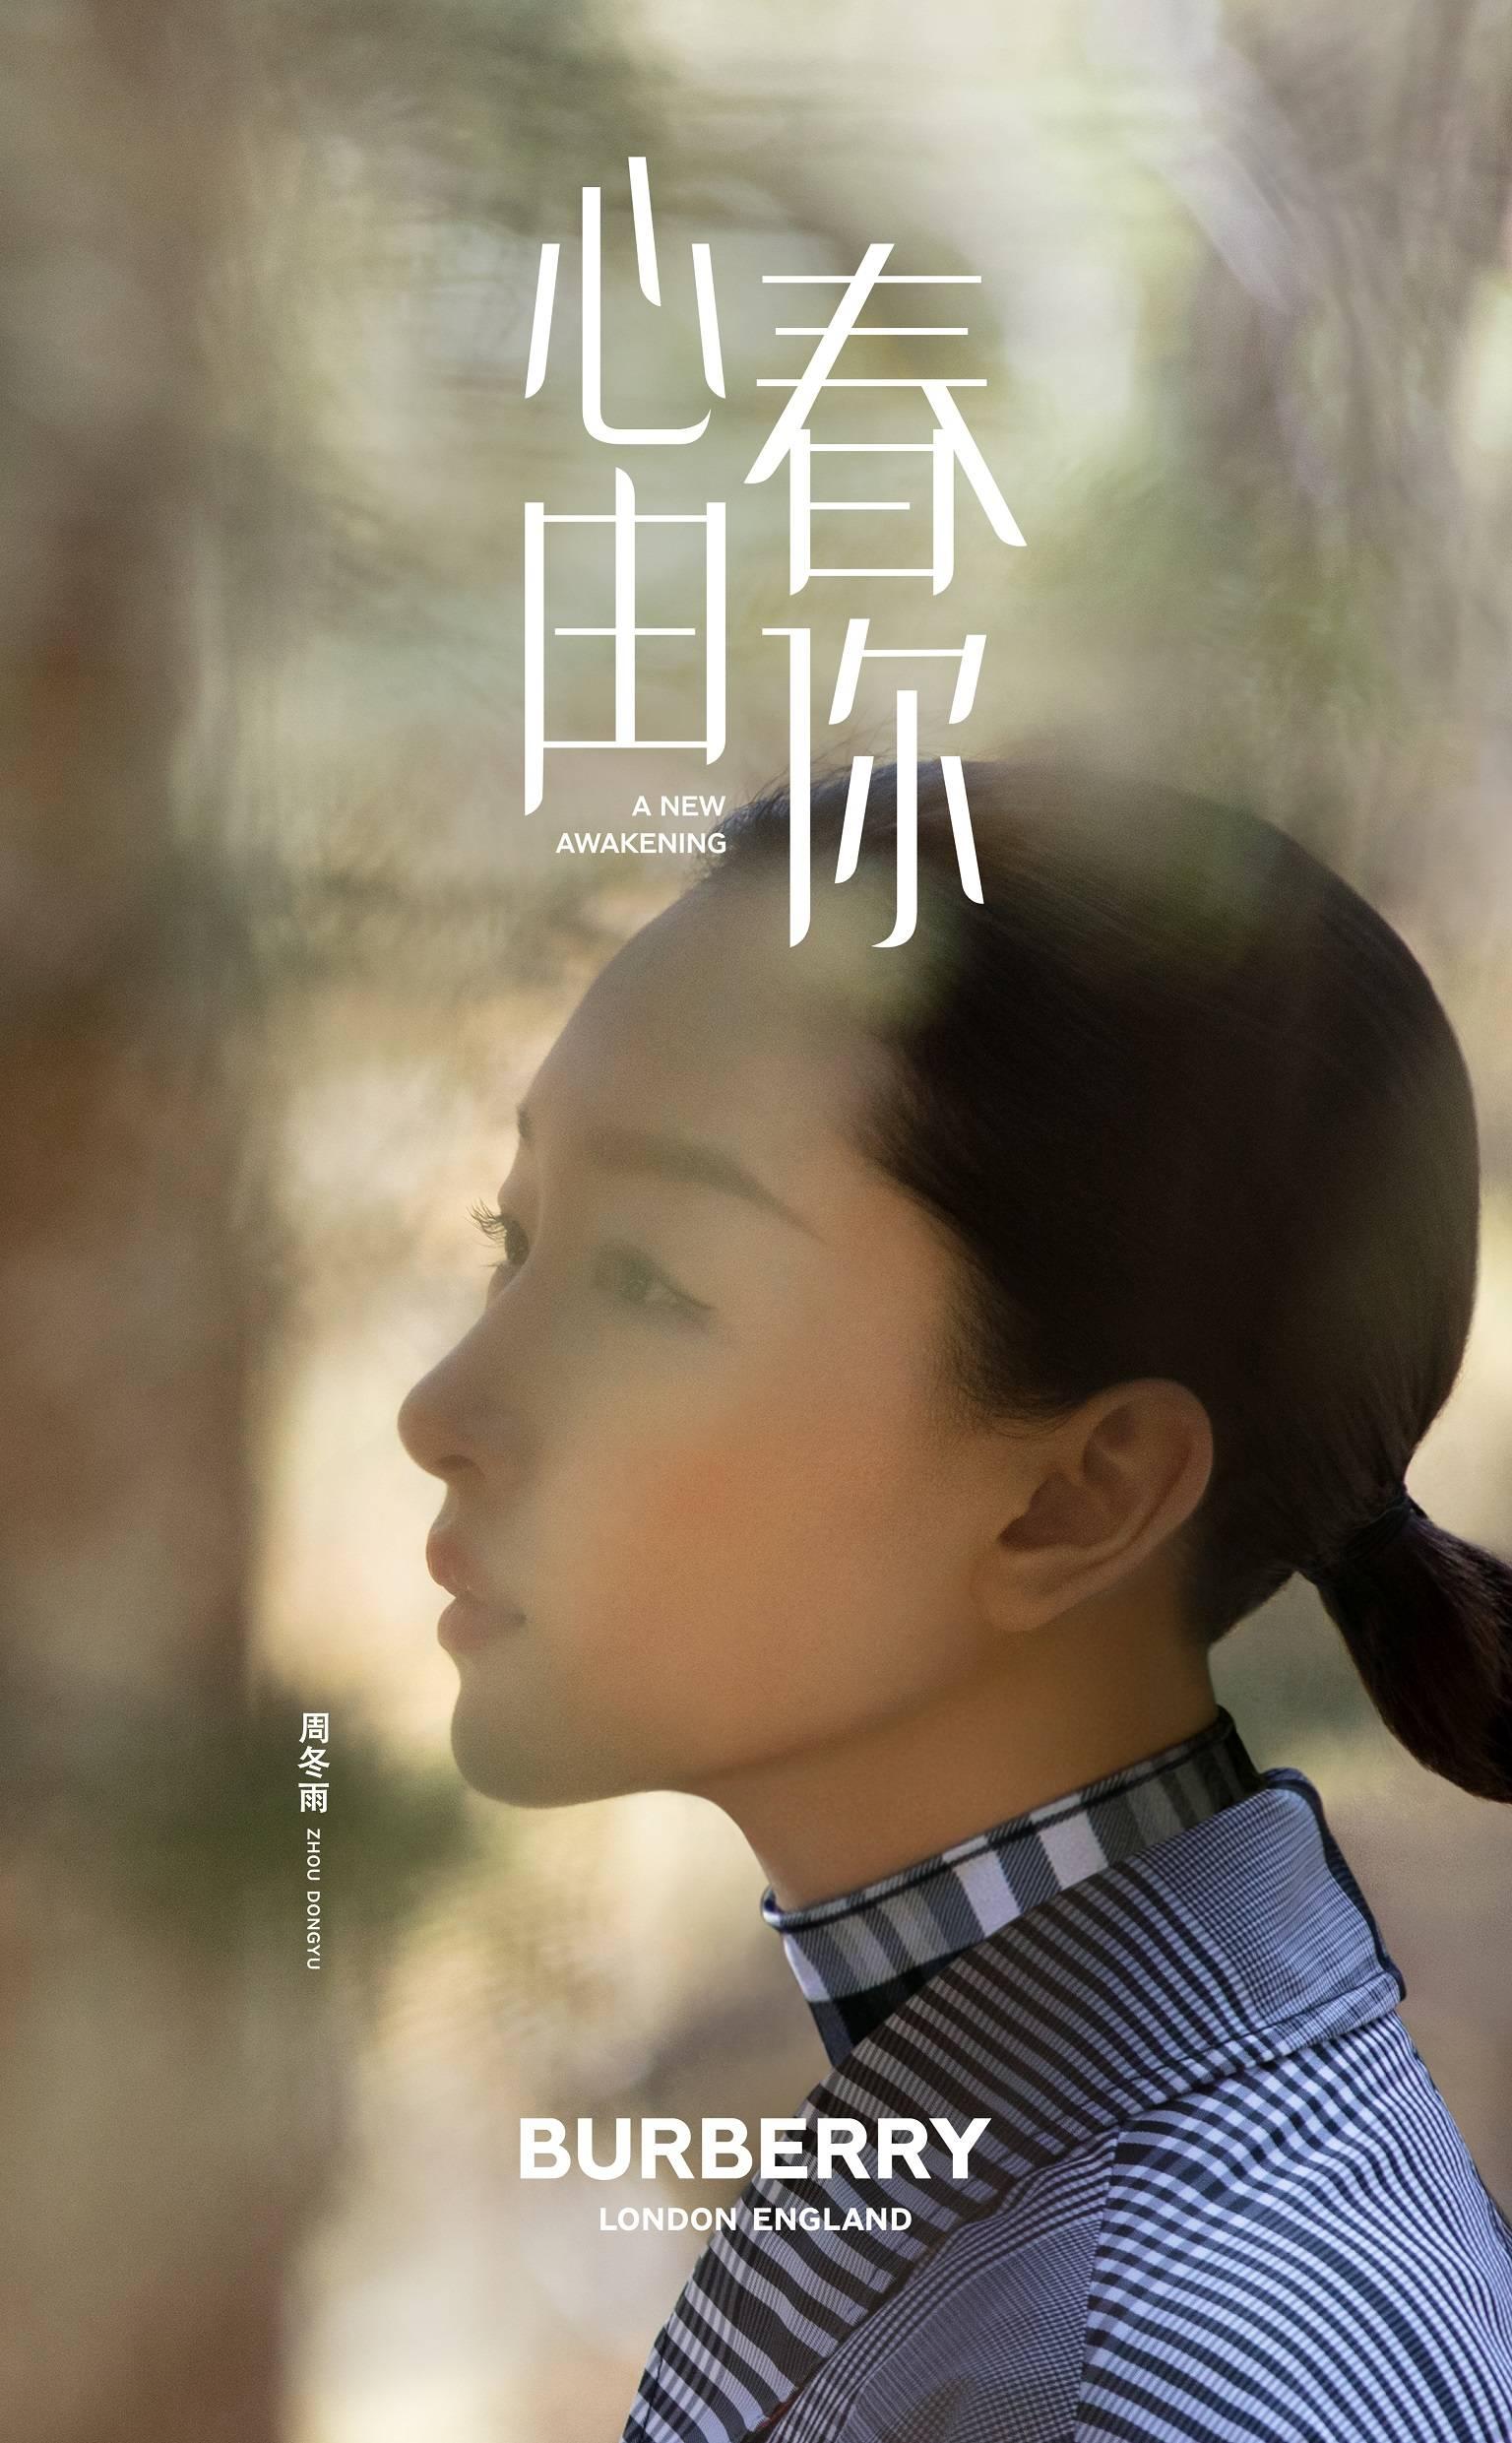 Burberry隆重推出新禧贺岁微电影《心春由你》,礼赞中国新年